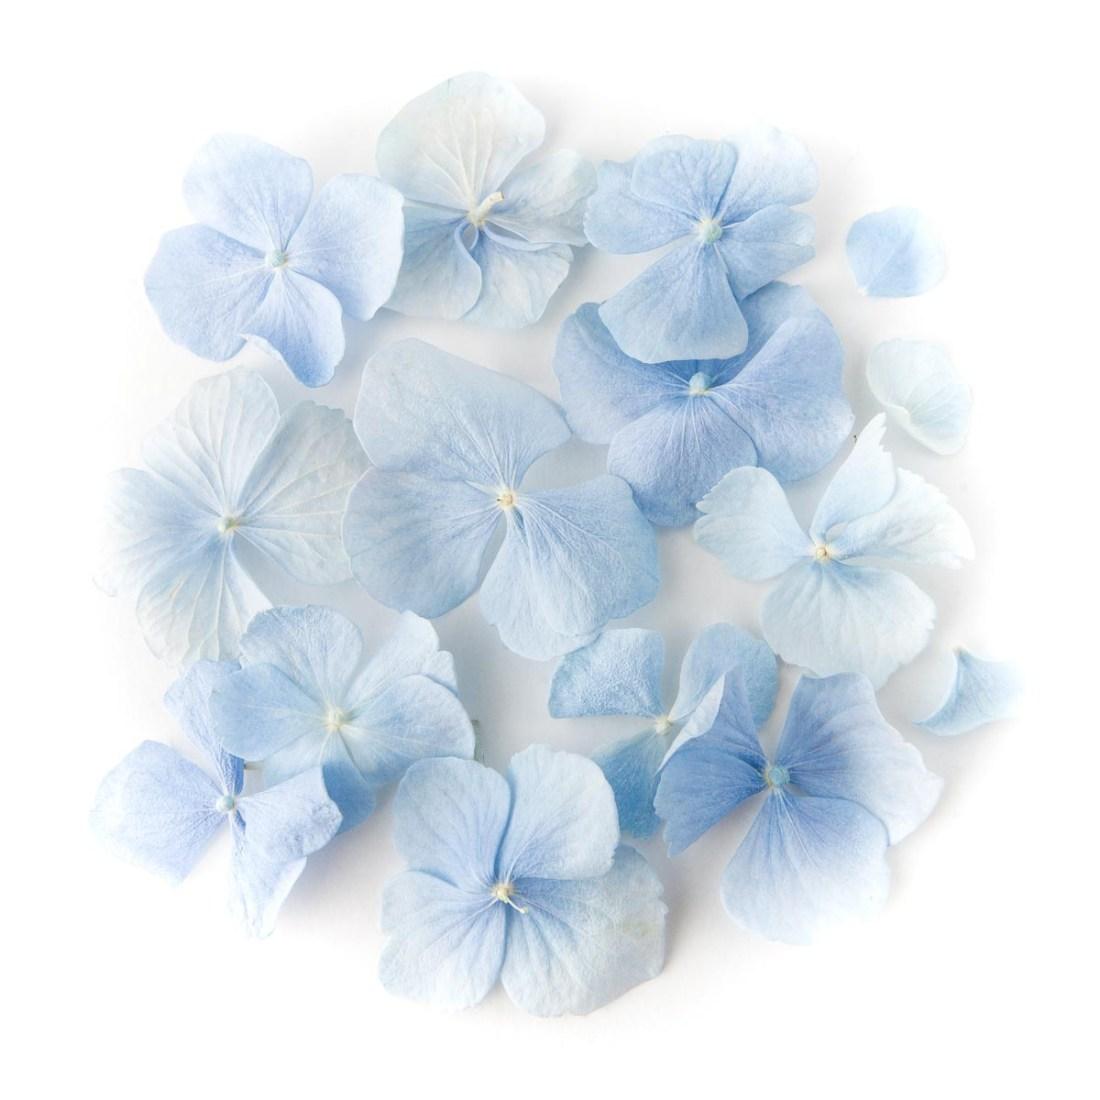 Flower petals - wedding aisles and petal pathways: Dusky Blue Hydrangea Petals